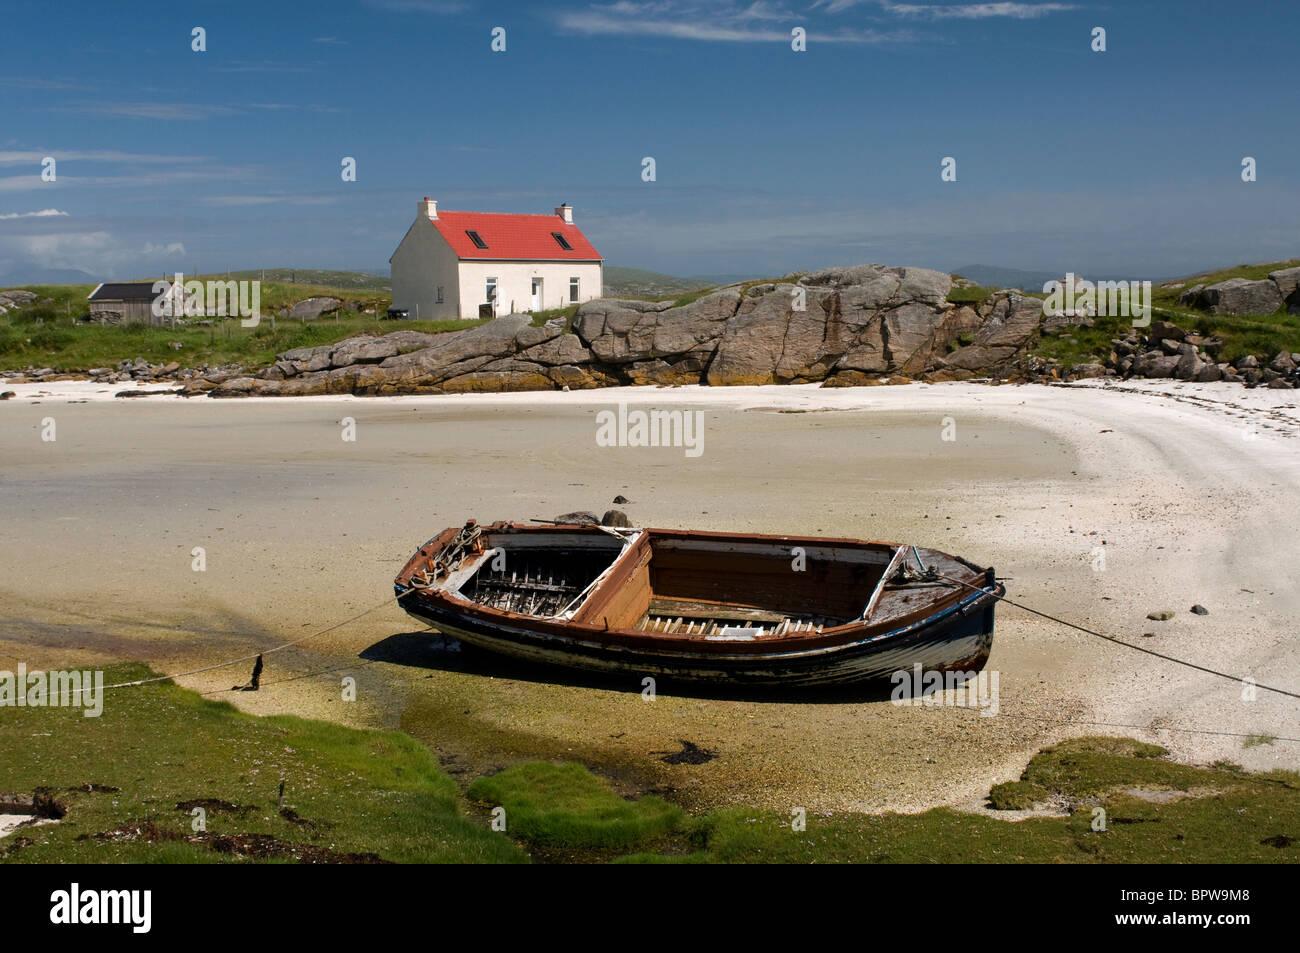 Crannag at Traig Mhor beach Isle of Barra, Outer Hebrides Western Isles. Scotland.  SCO 6539 - Stock Image